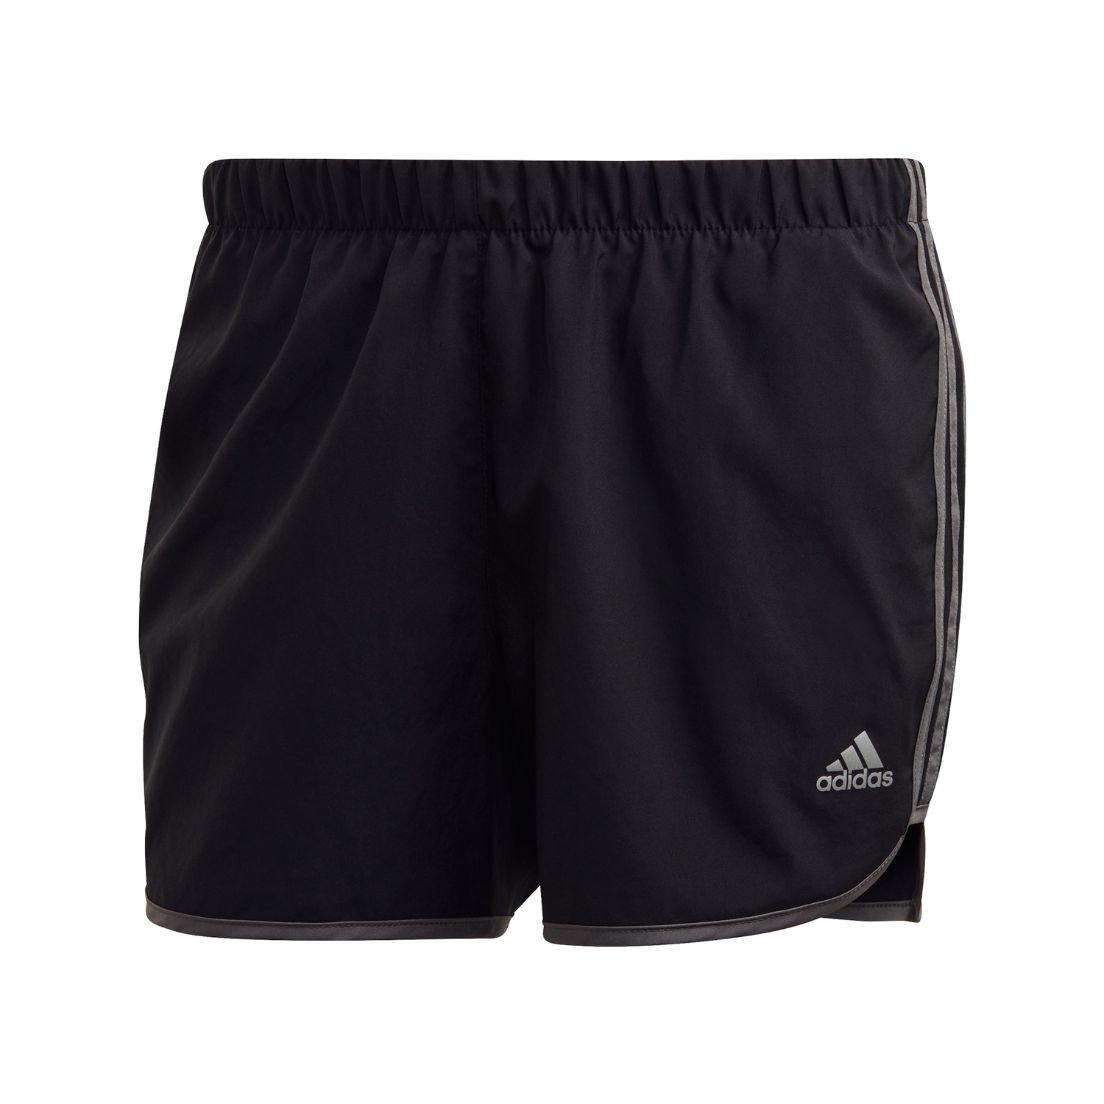 Short Negro Adidas Marathon